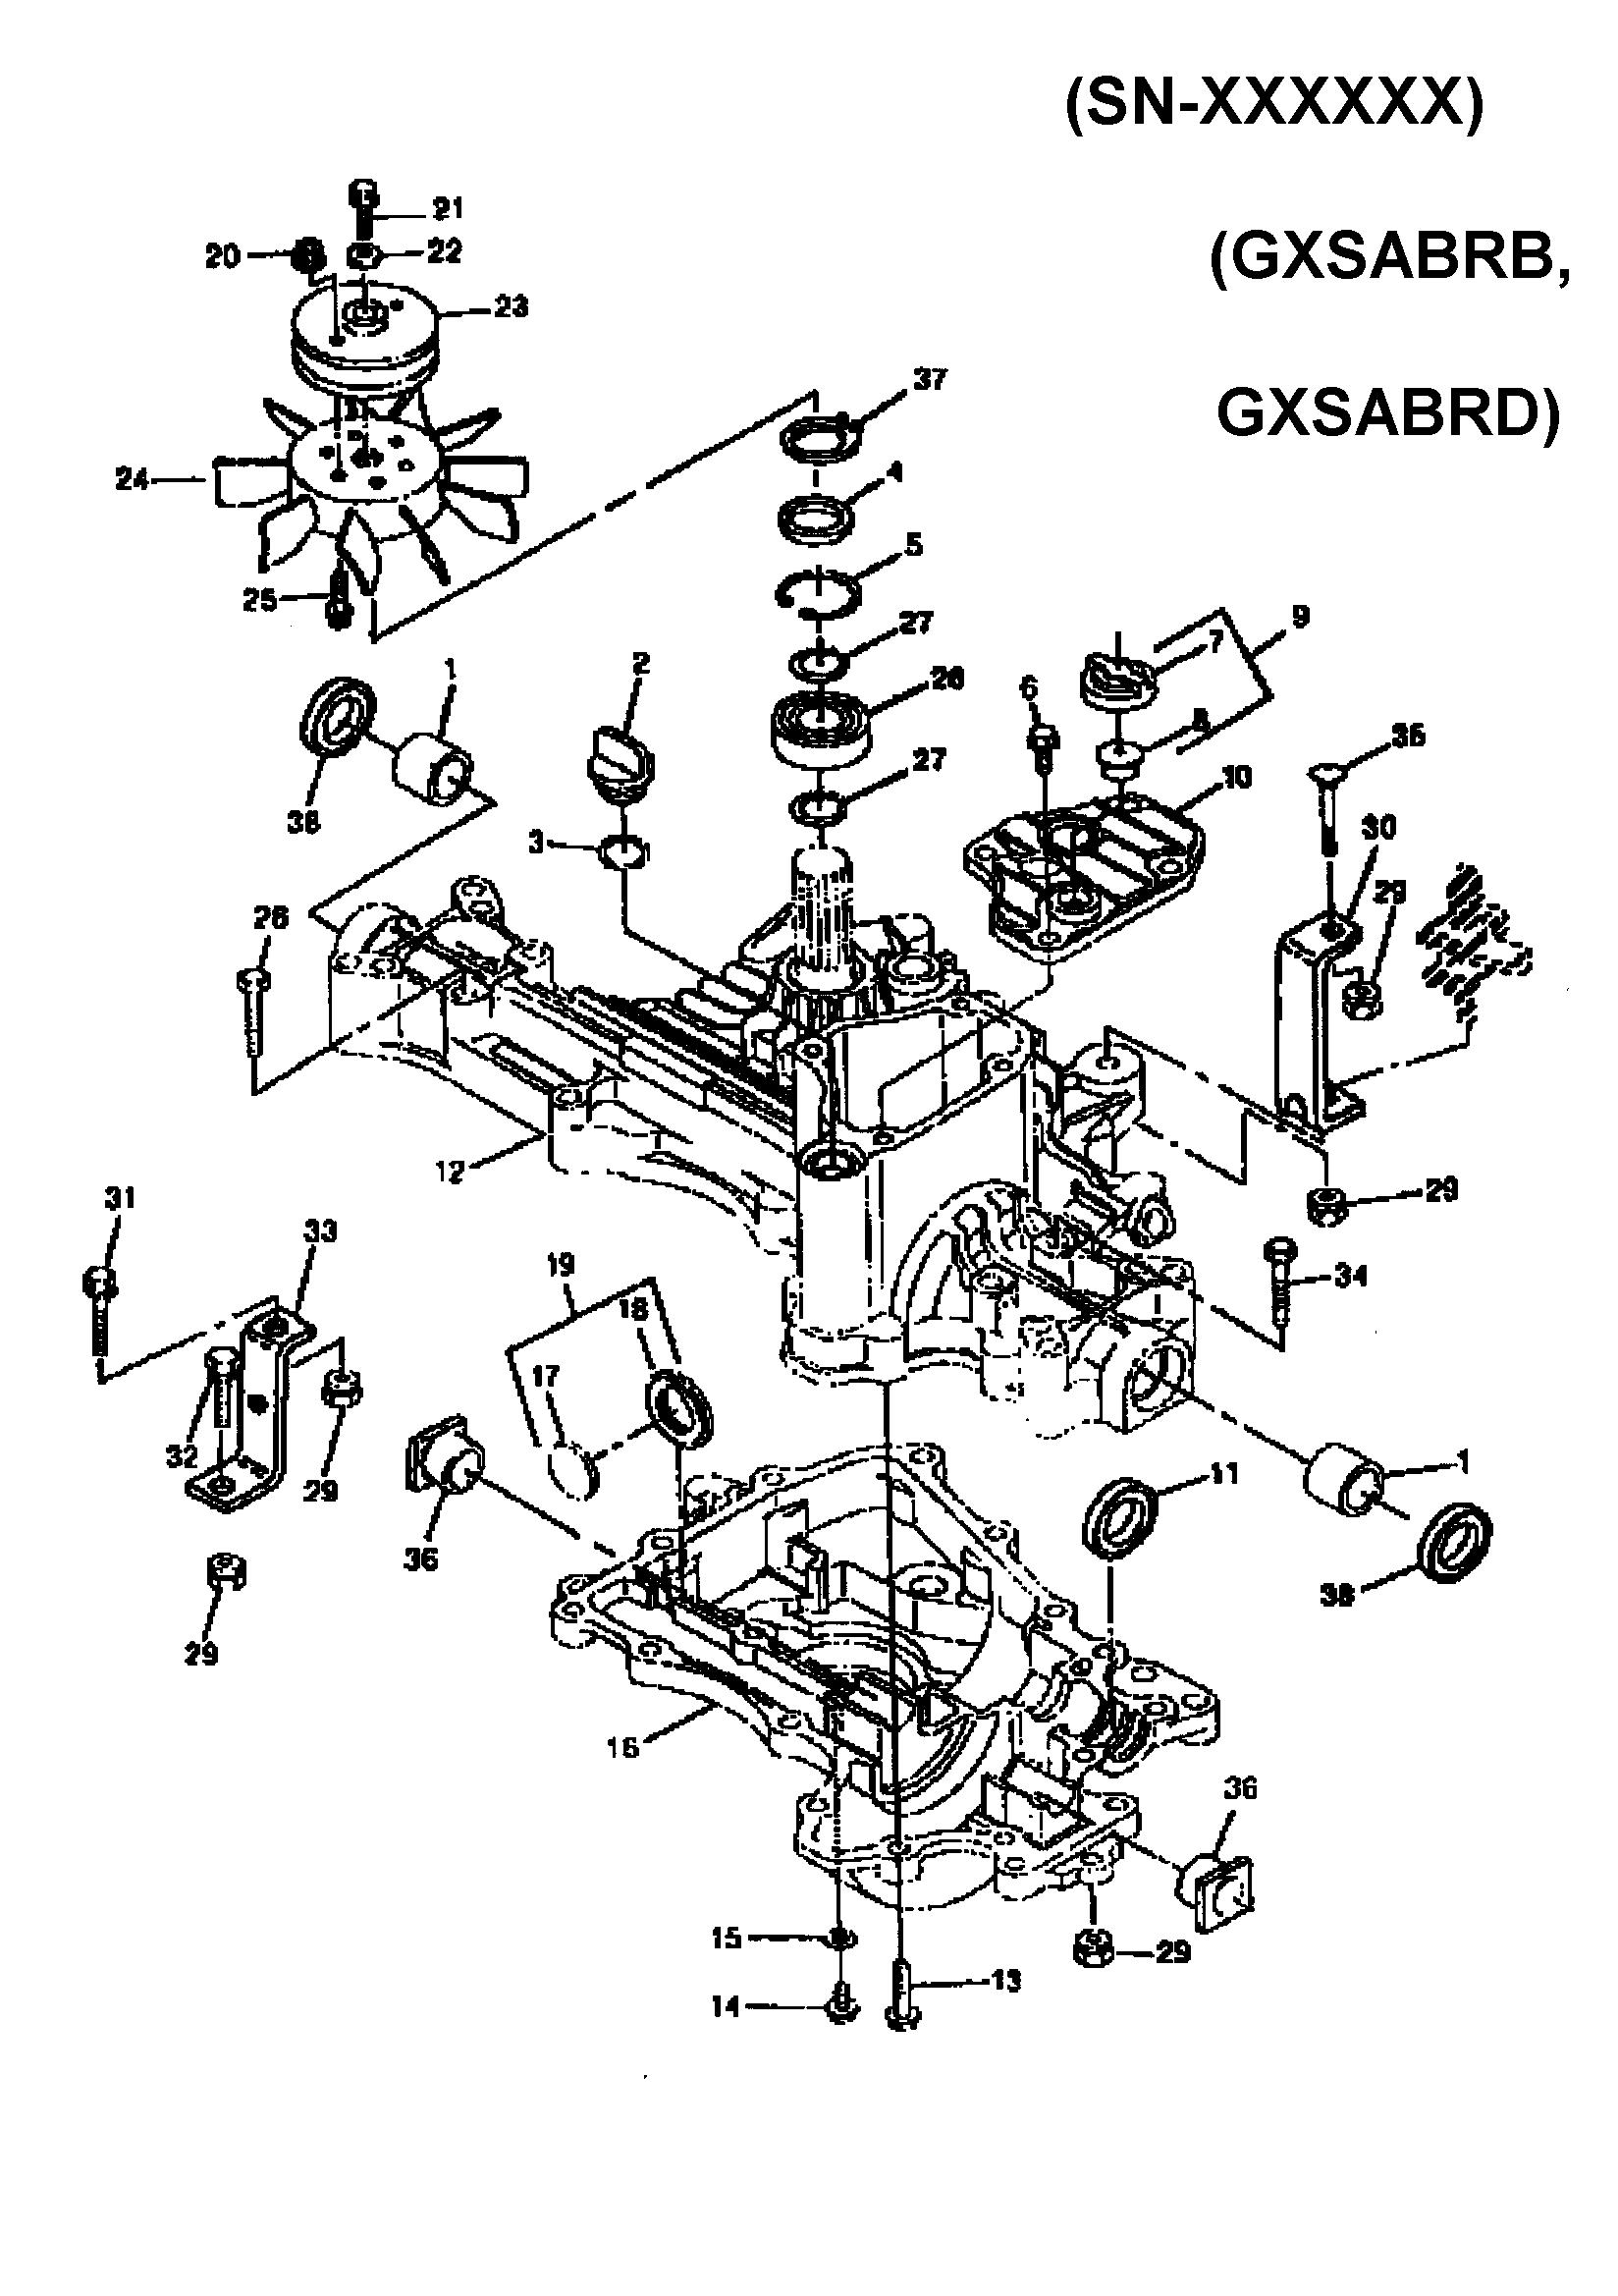 [TBQL_4184]  WG_3936] Lx279 Wiring Diagram Wiring Diagram | John Deere Tractor Wiring Harness Diagram |  | Sulf Sapebe Inama Mohammedshrine Librar Wiring 101